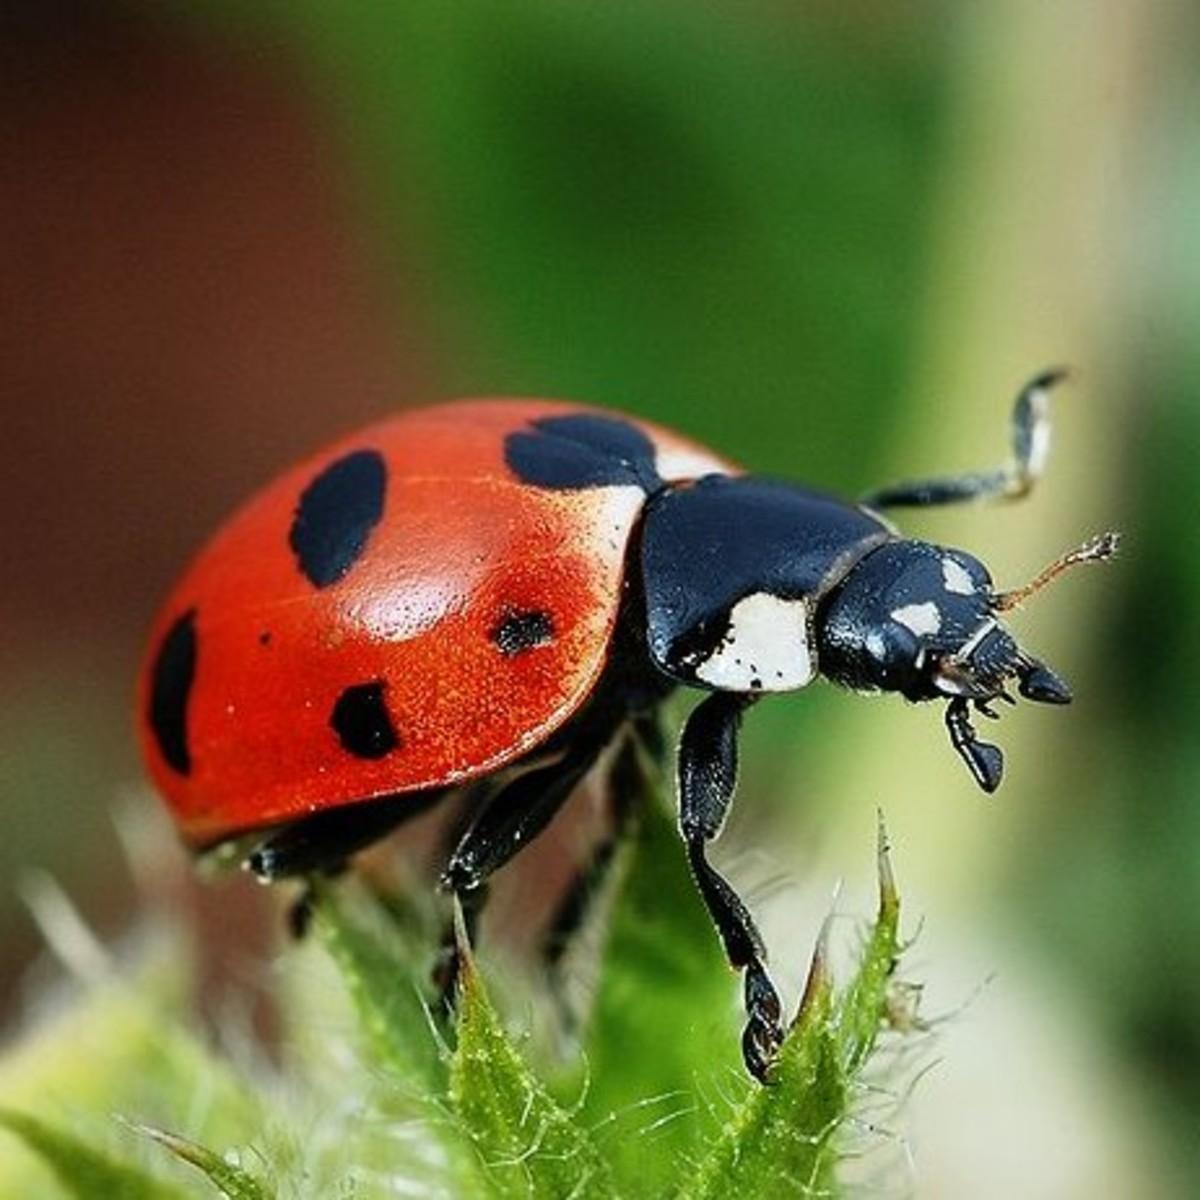 Beneficial Bugs: Ladbugs